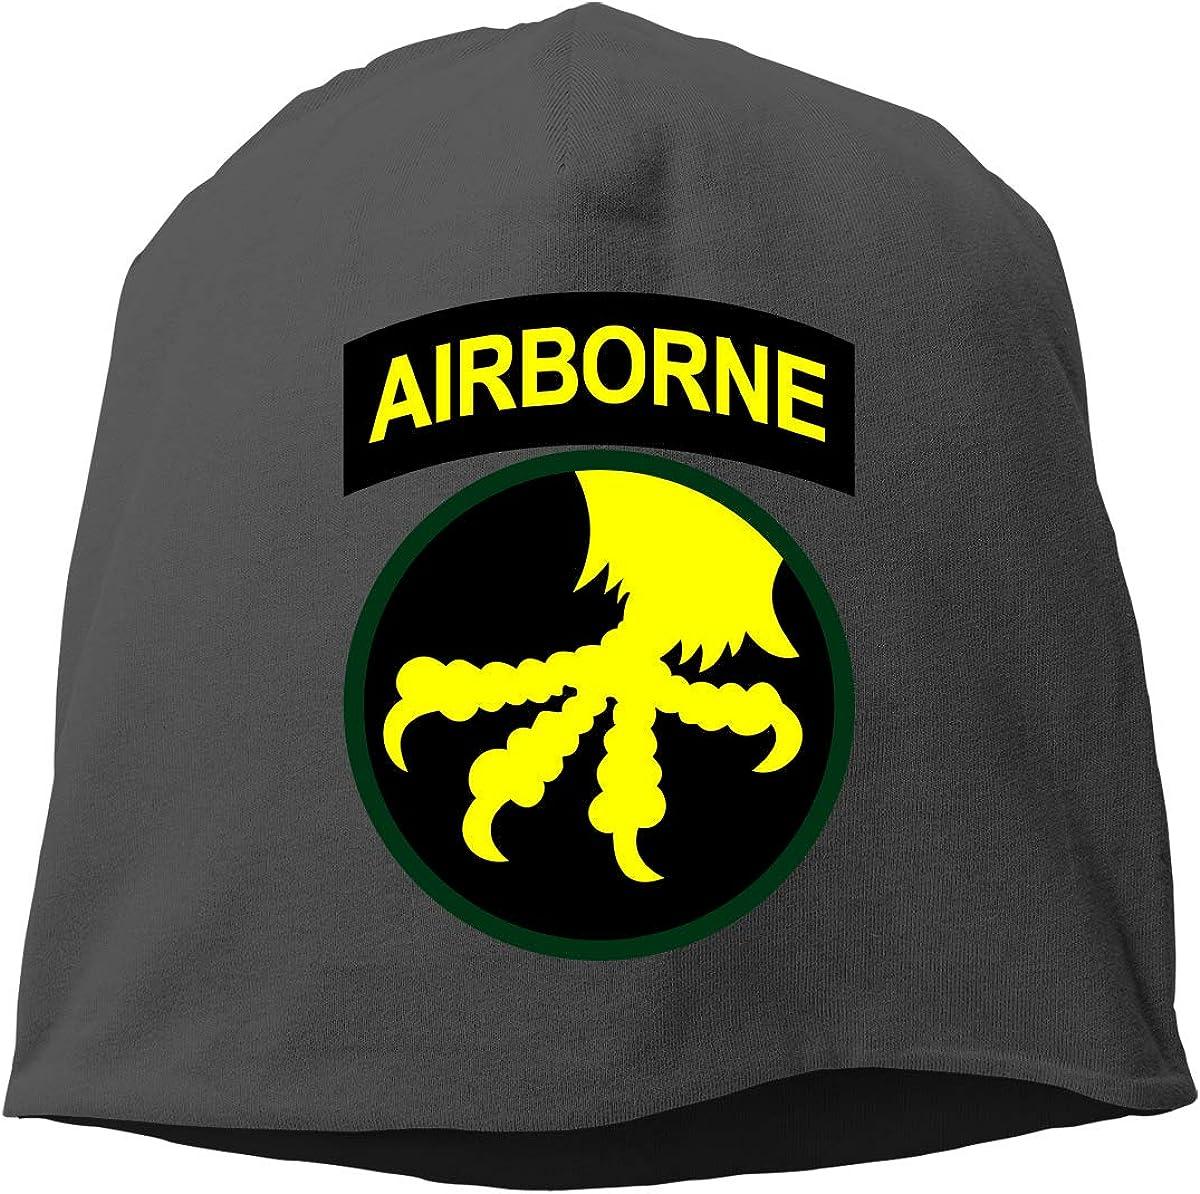 17th Airborne Division Unisex Knitted Hat Beanie Hat Warm Hats Skull Cap Beanie Hat